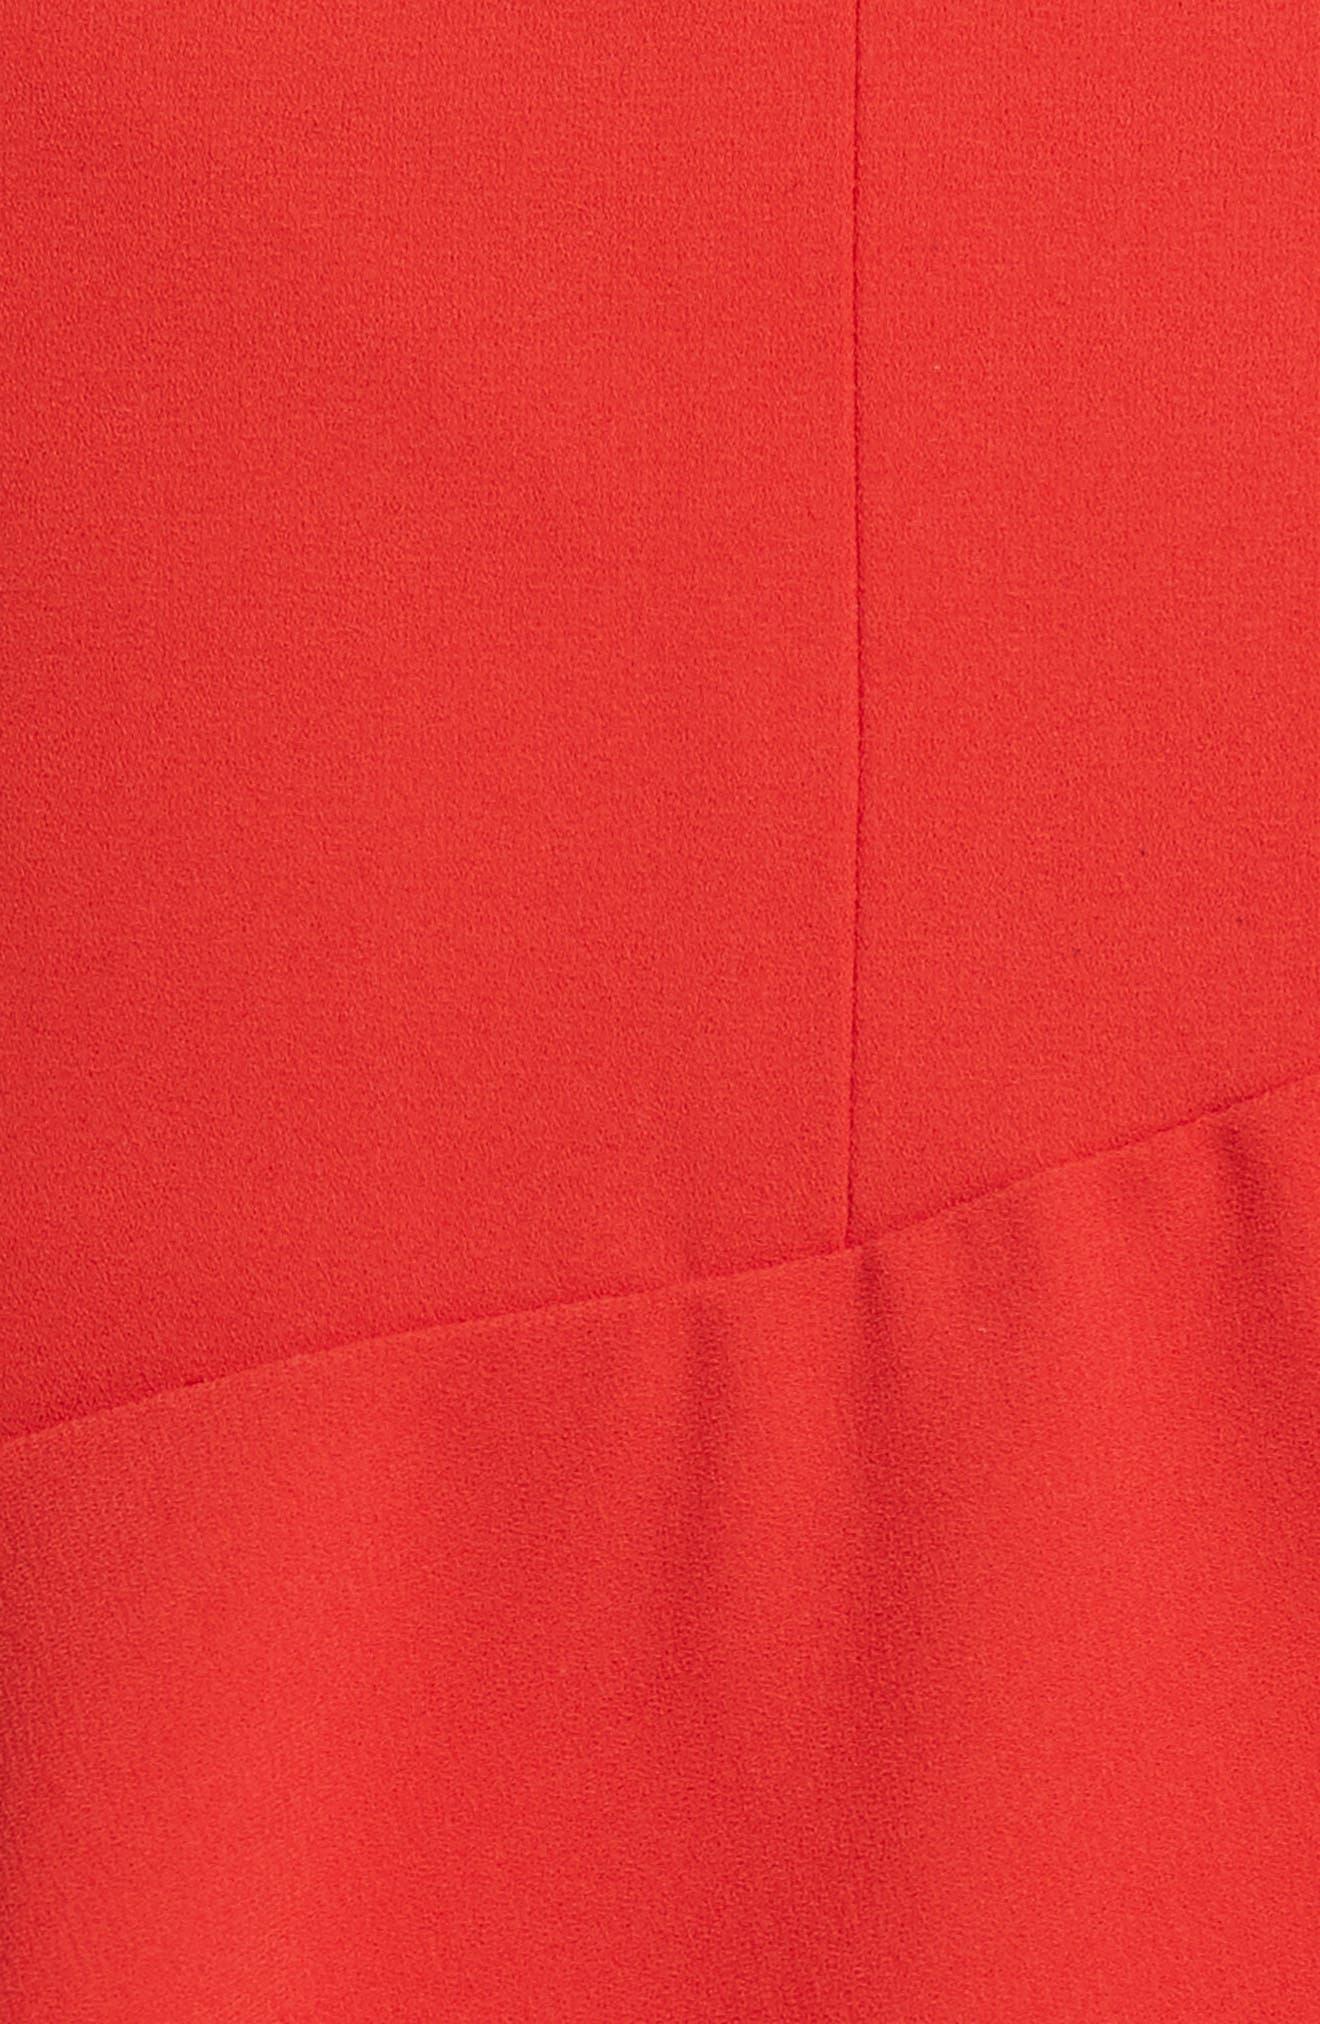 Nisa Ruffle Miniskirt,                             Alternate thumbnail 5, color,                             612